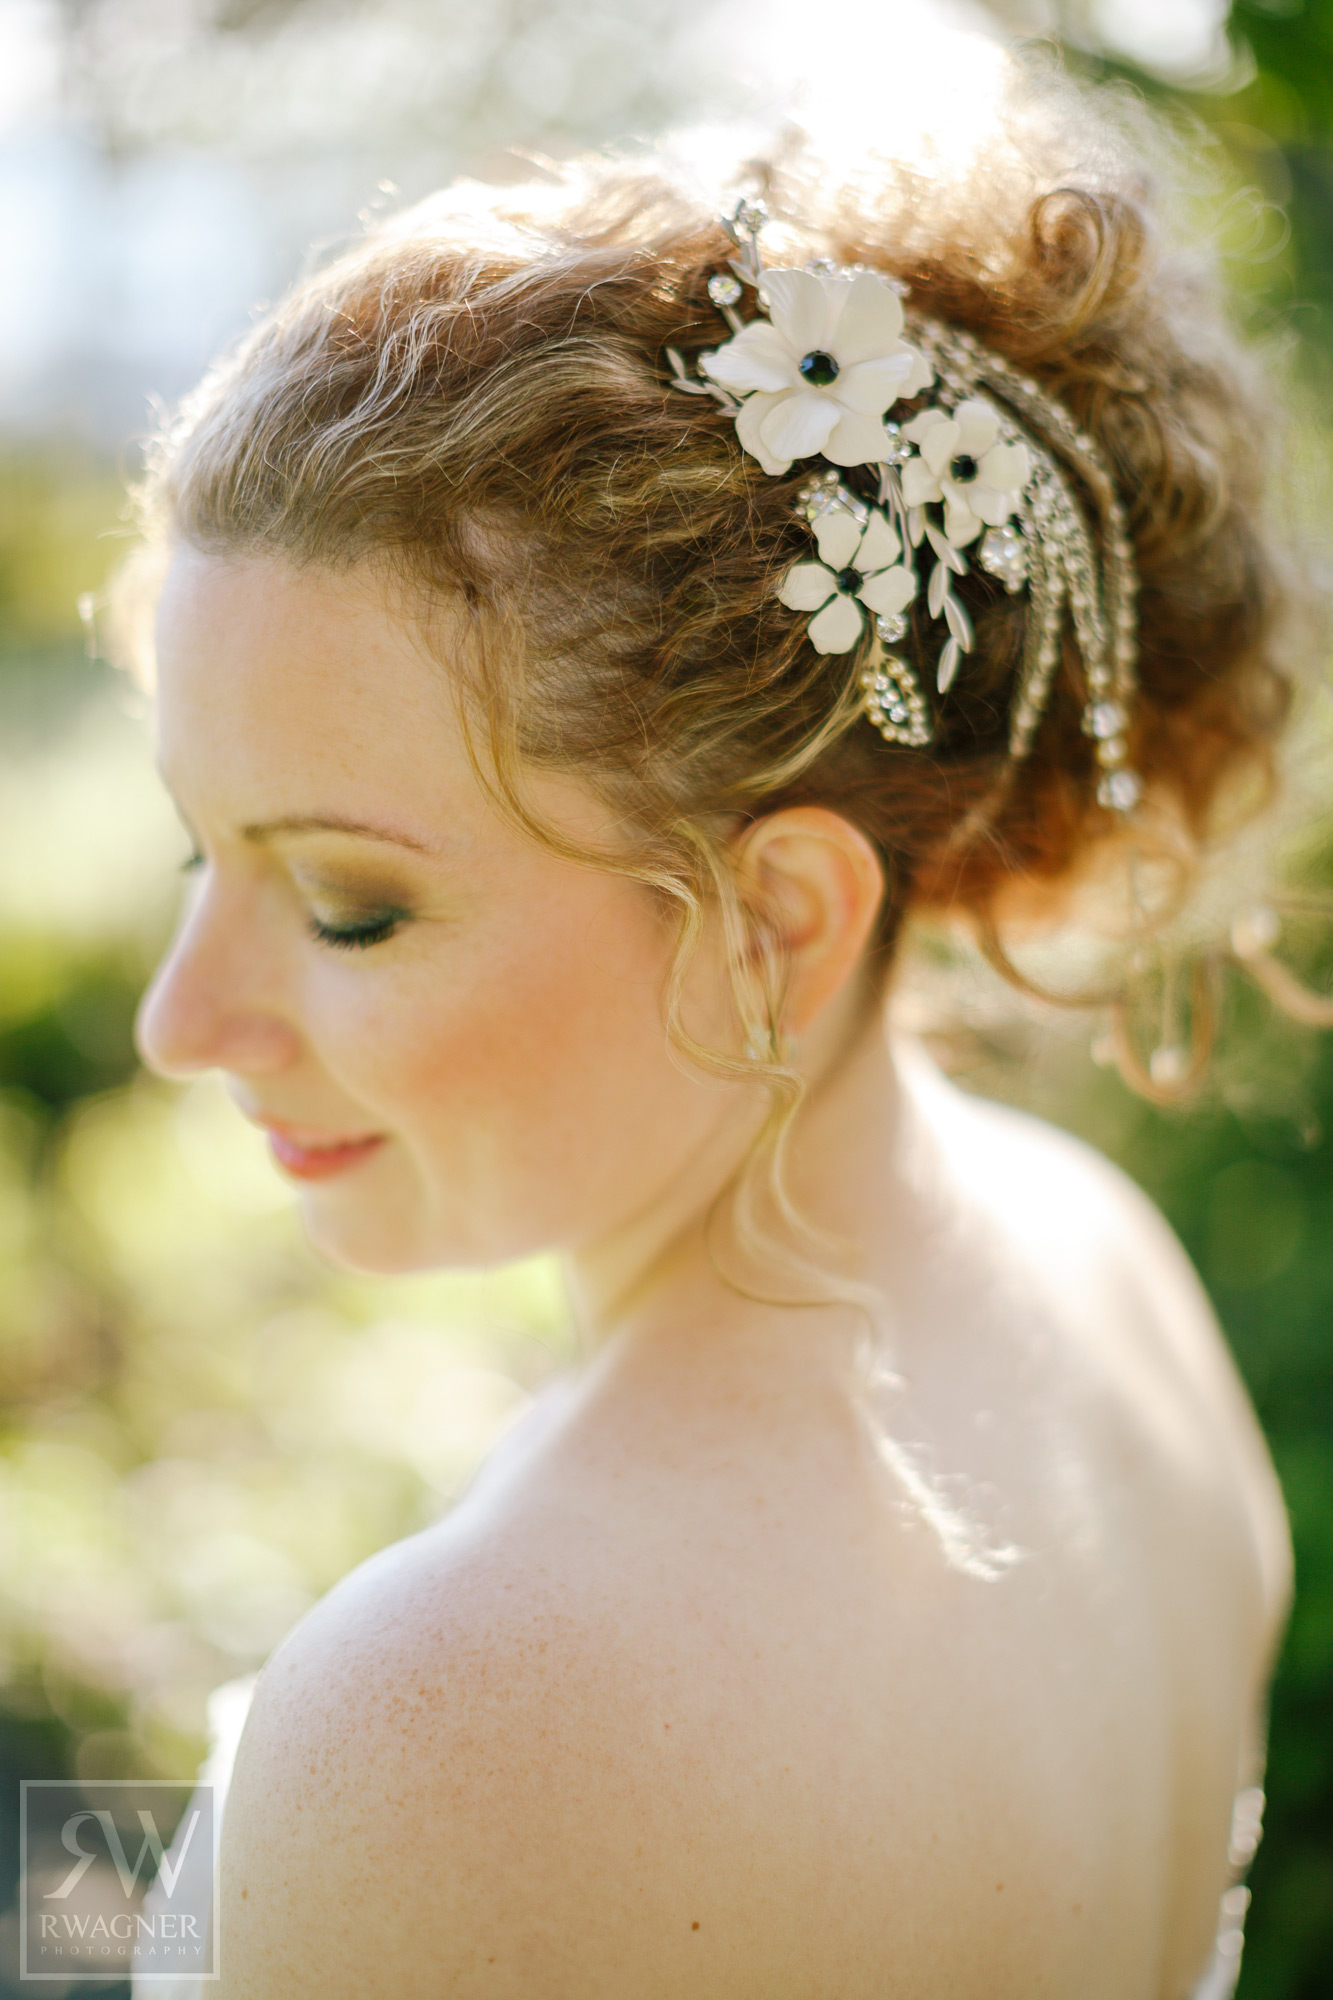 ceci_new_york_luxury_wedding_invitations_couture_red_black_white_real_wedding_dramatic_inn_at_longshore_v286_10.jpg